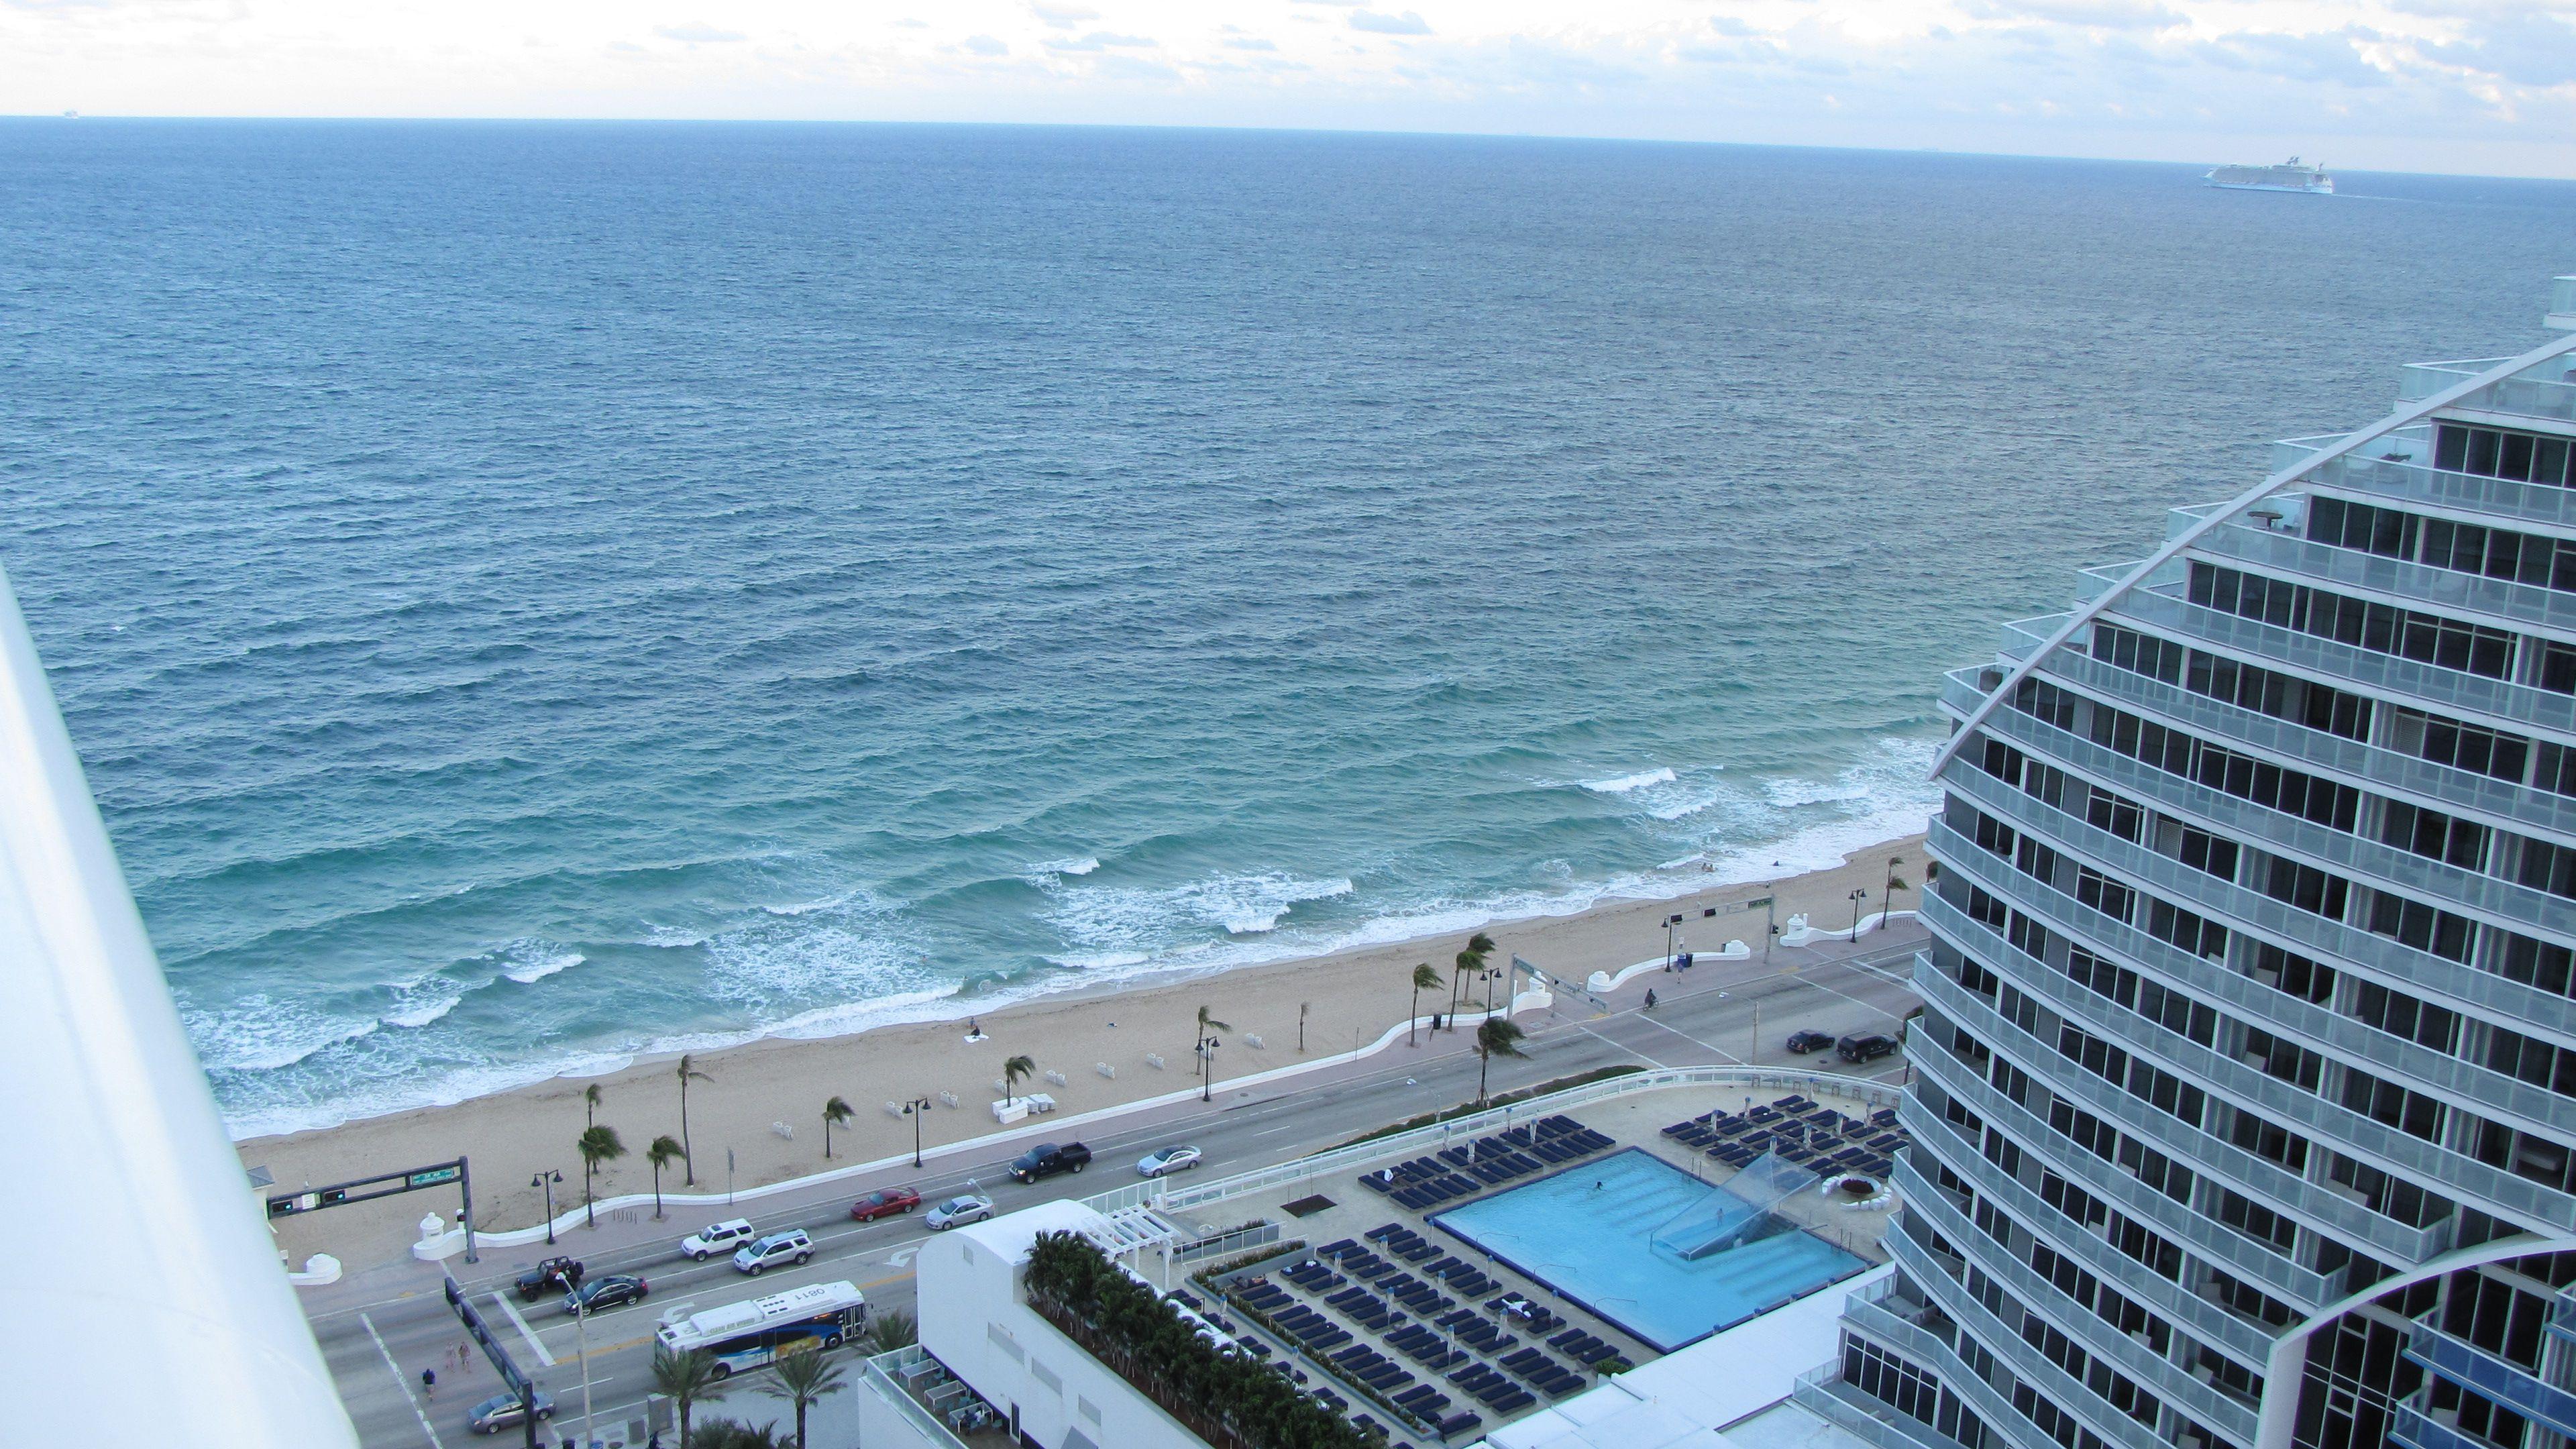 Fort Lauderdale Beach The Atlantic Ocean The W Hotel One